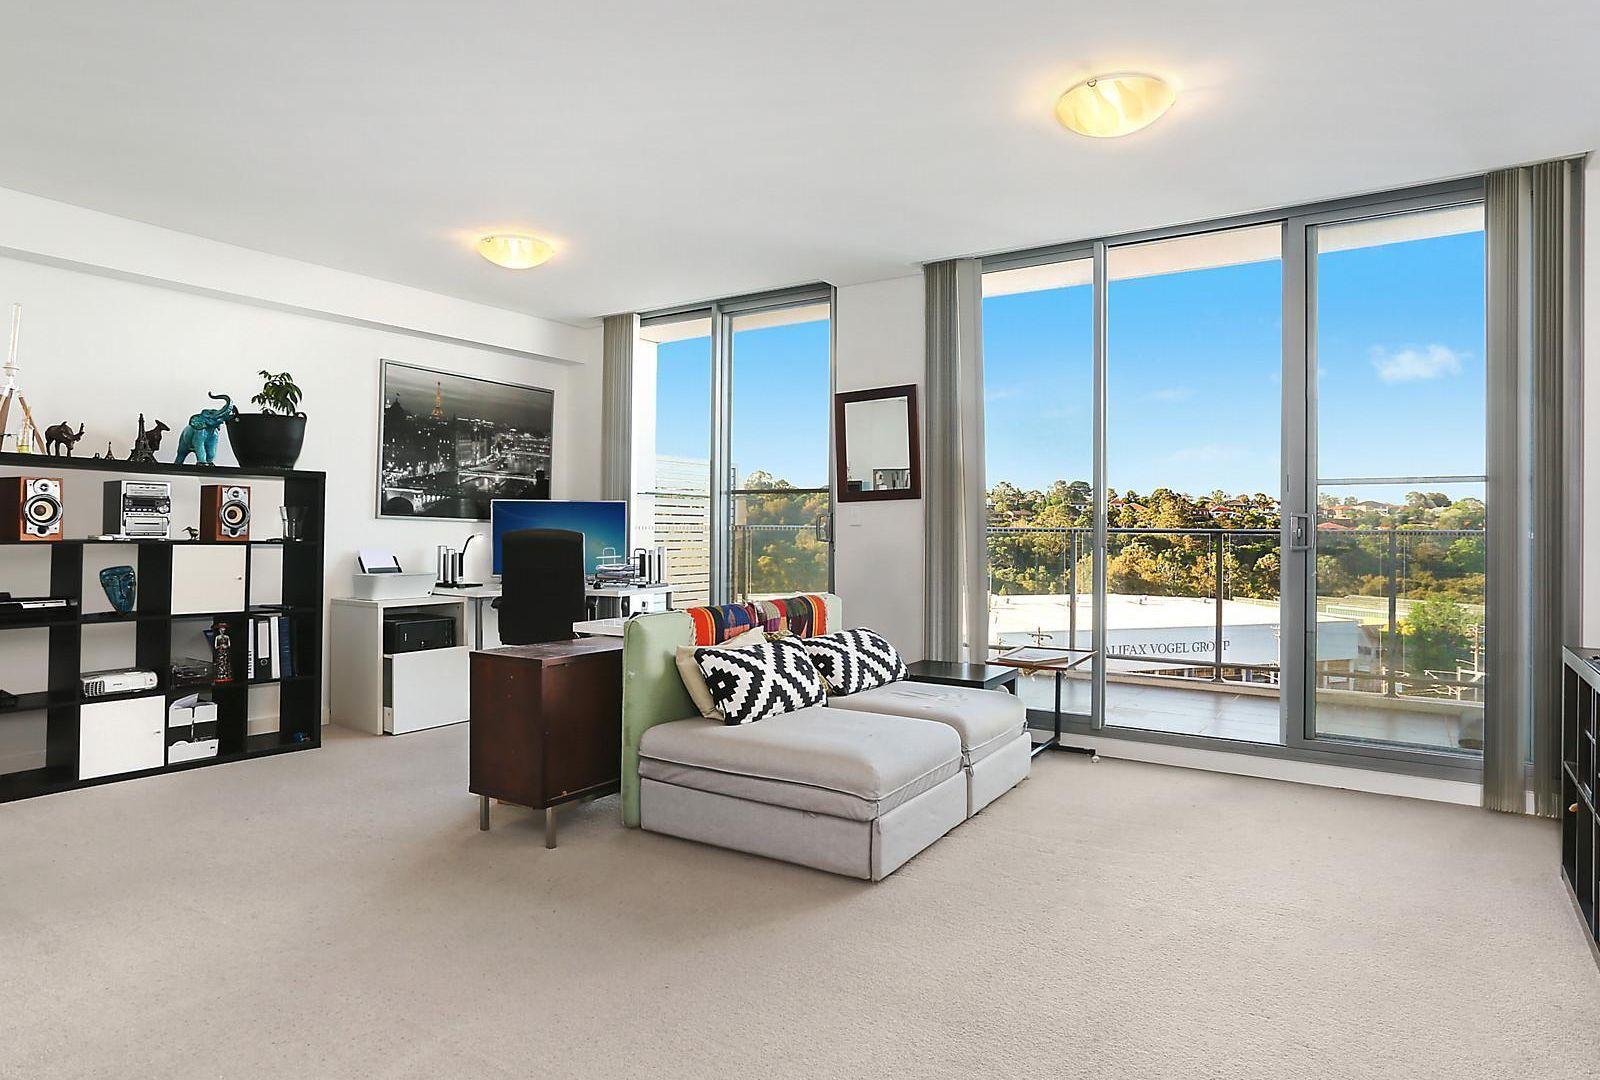 502/52 Loftus Street, Turrella NSW 2205, Image 1